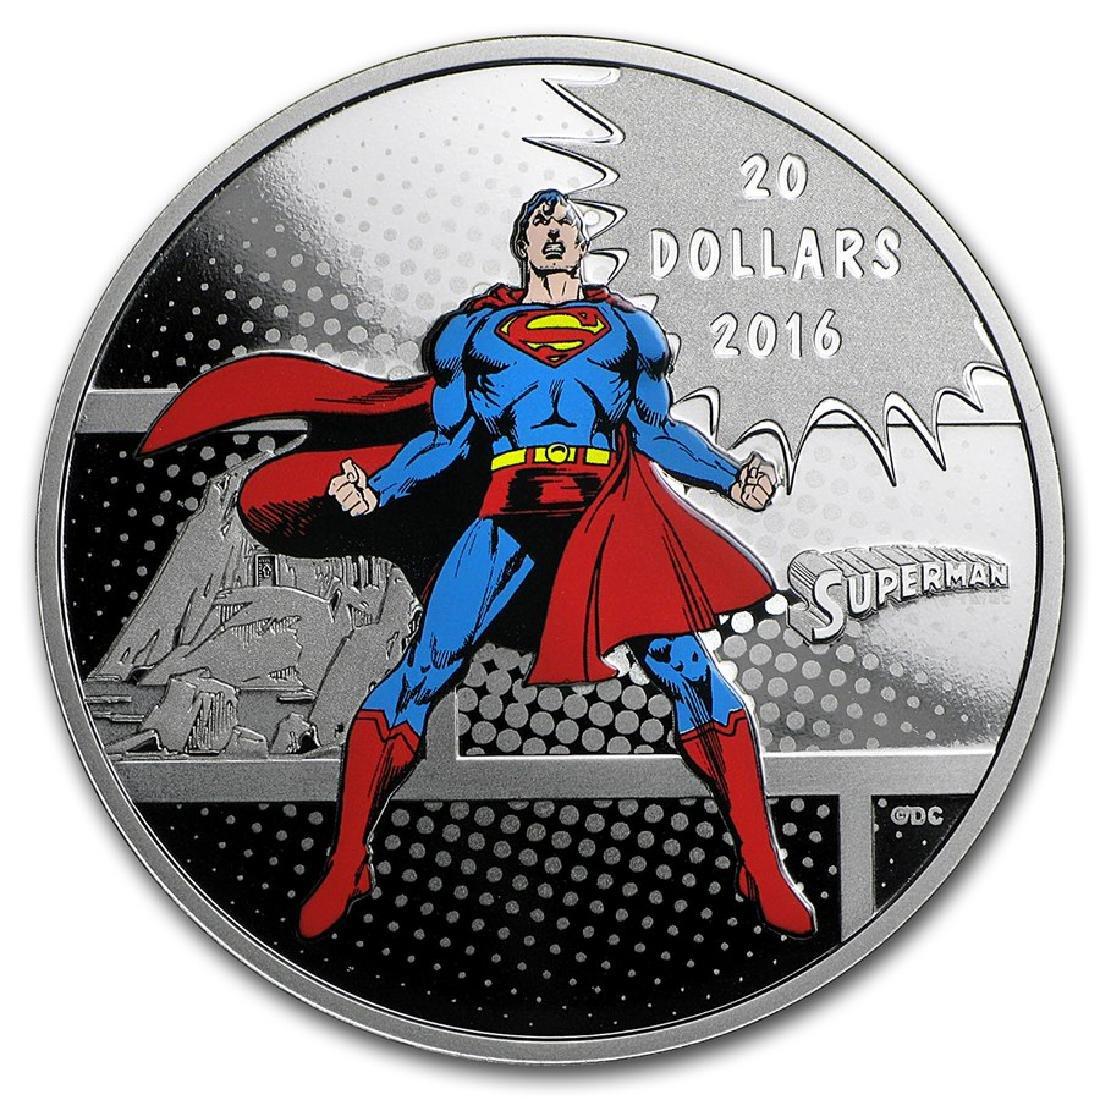 2016 $20 Canada Man of Steel 1 oz Silver Coin